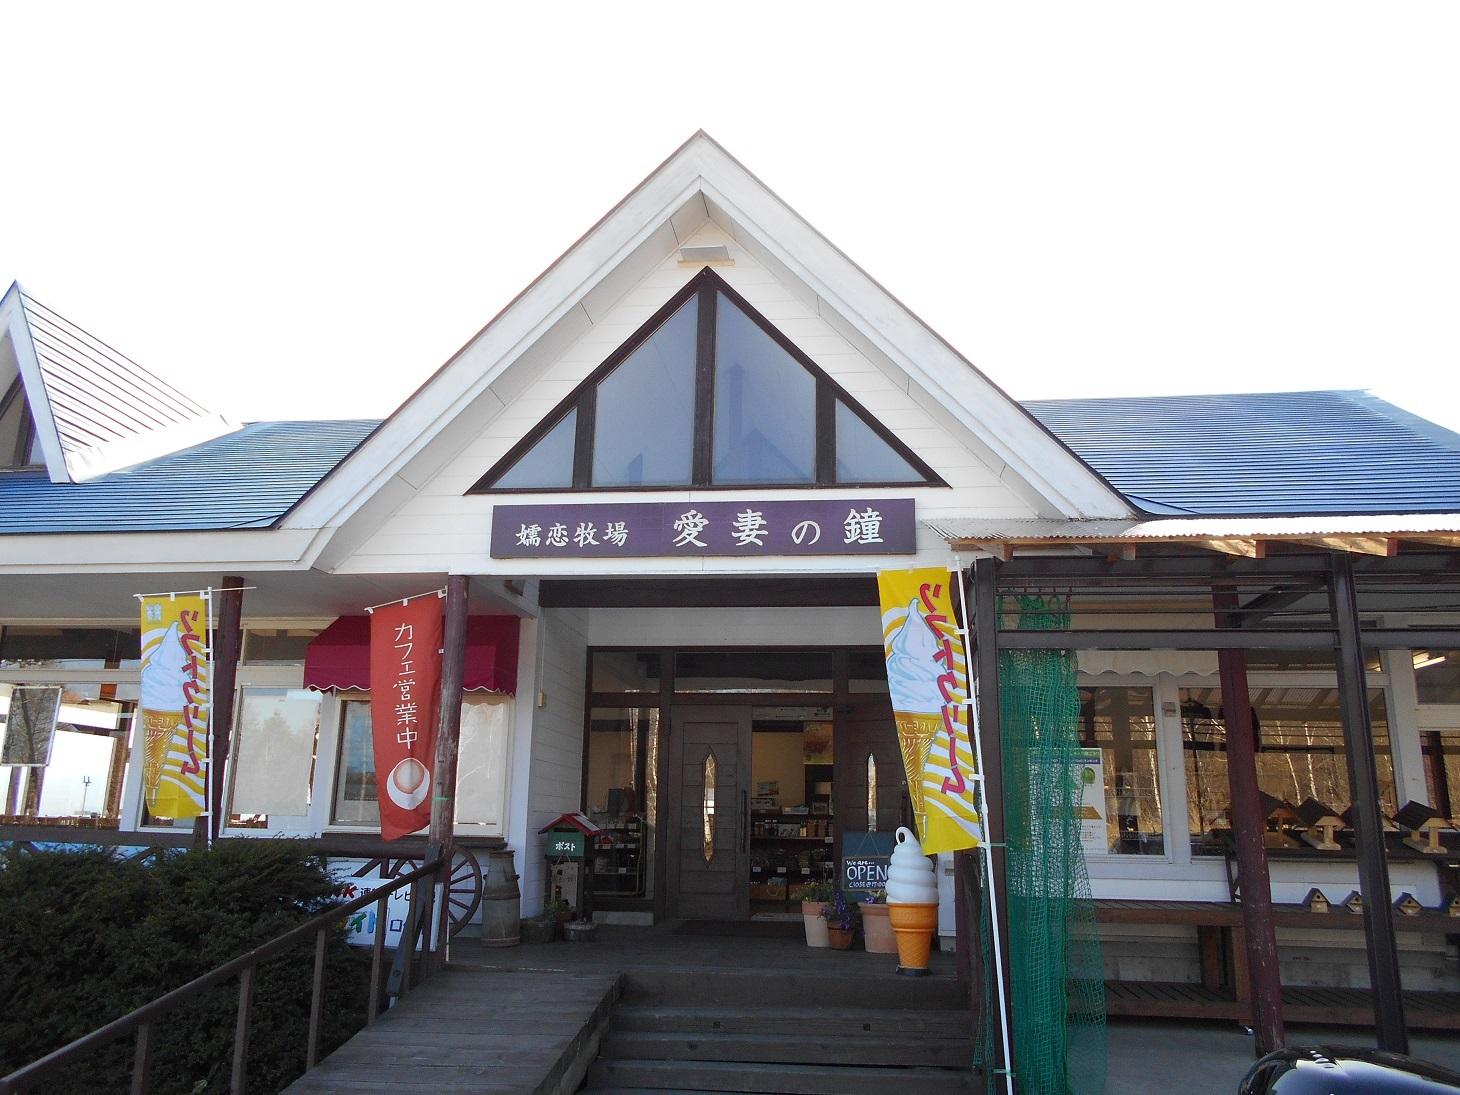 DSCN0273滋賀高原